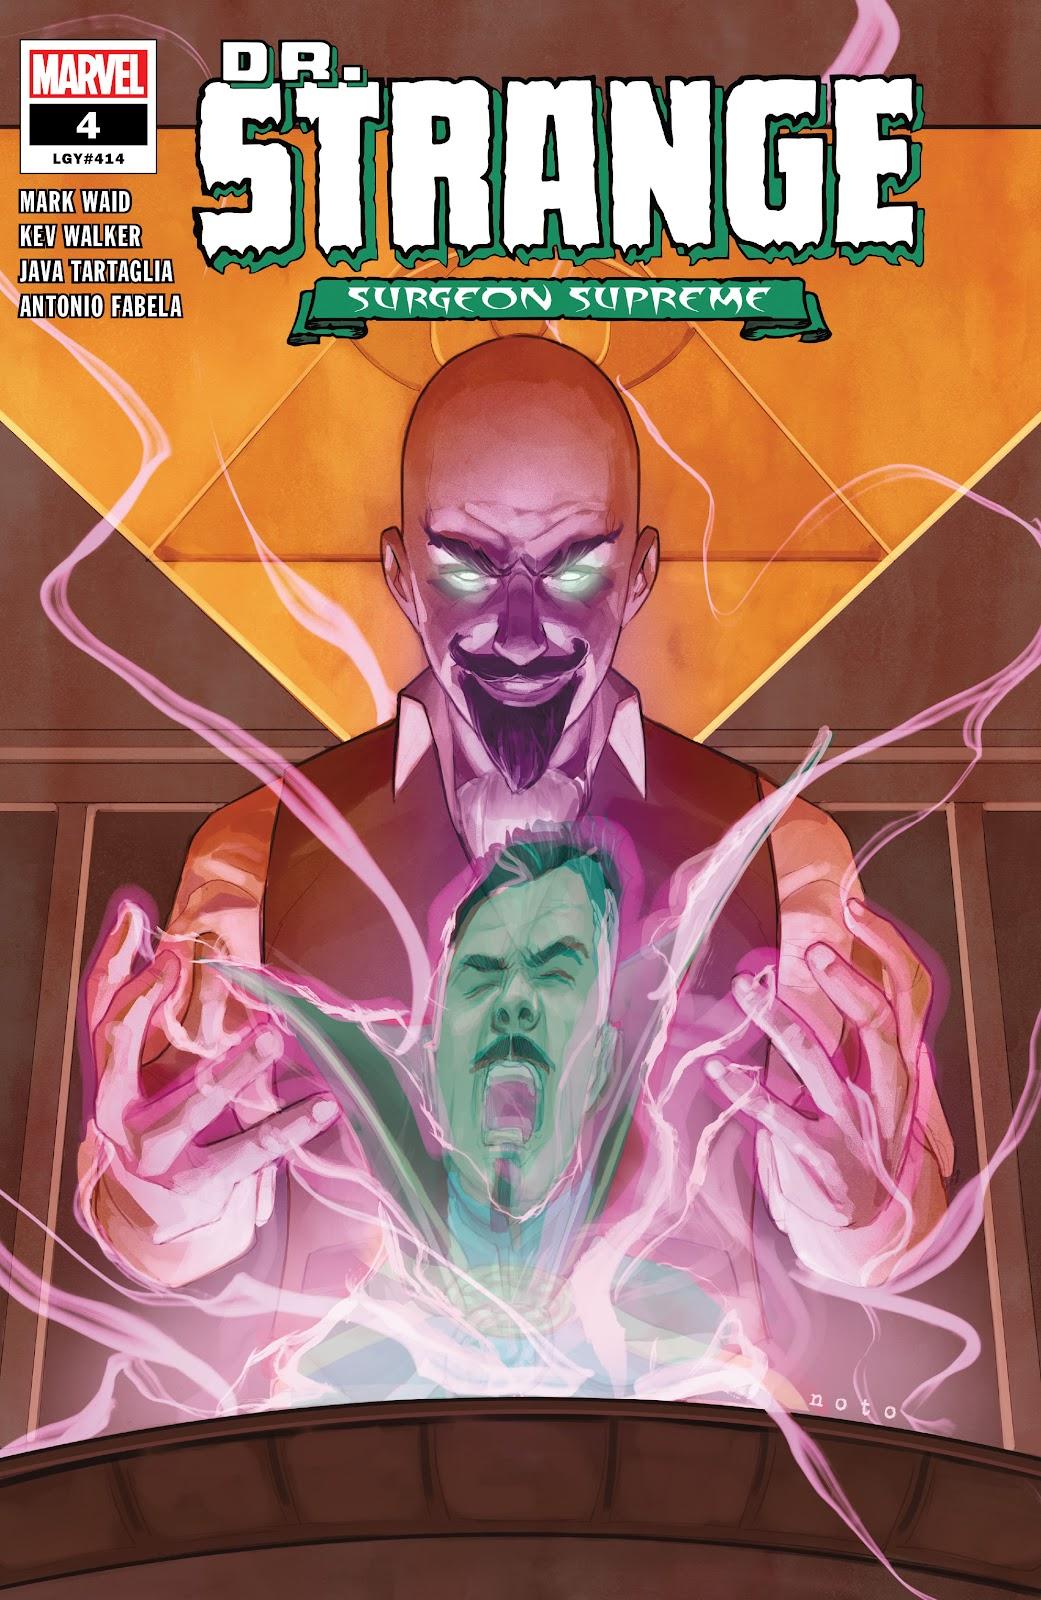 Read online Dr. Strange comic -  Issue #4 - 1